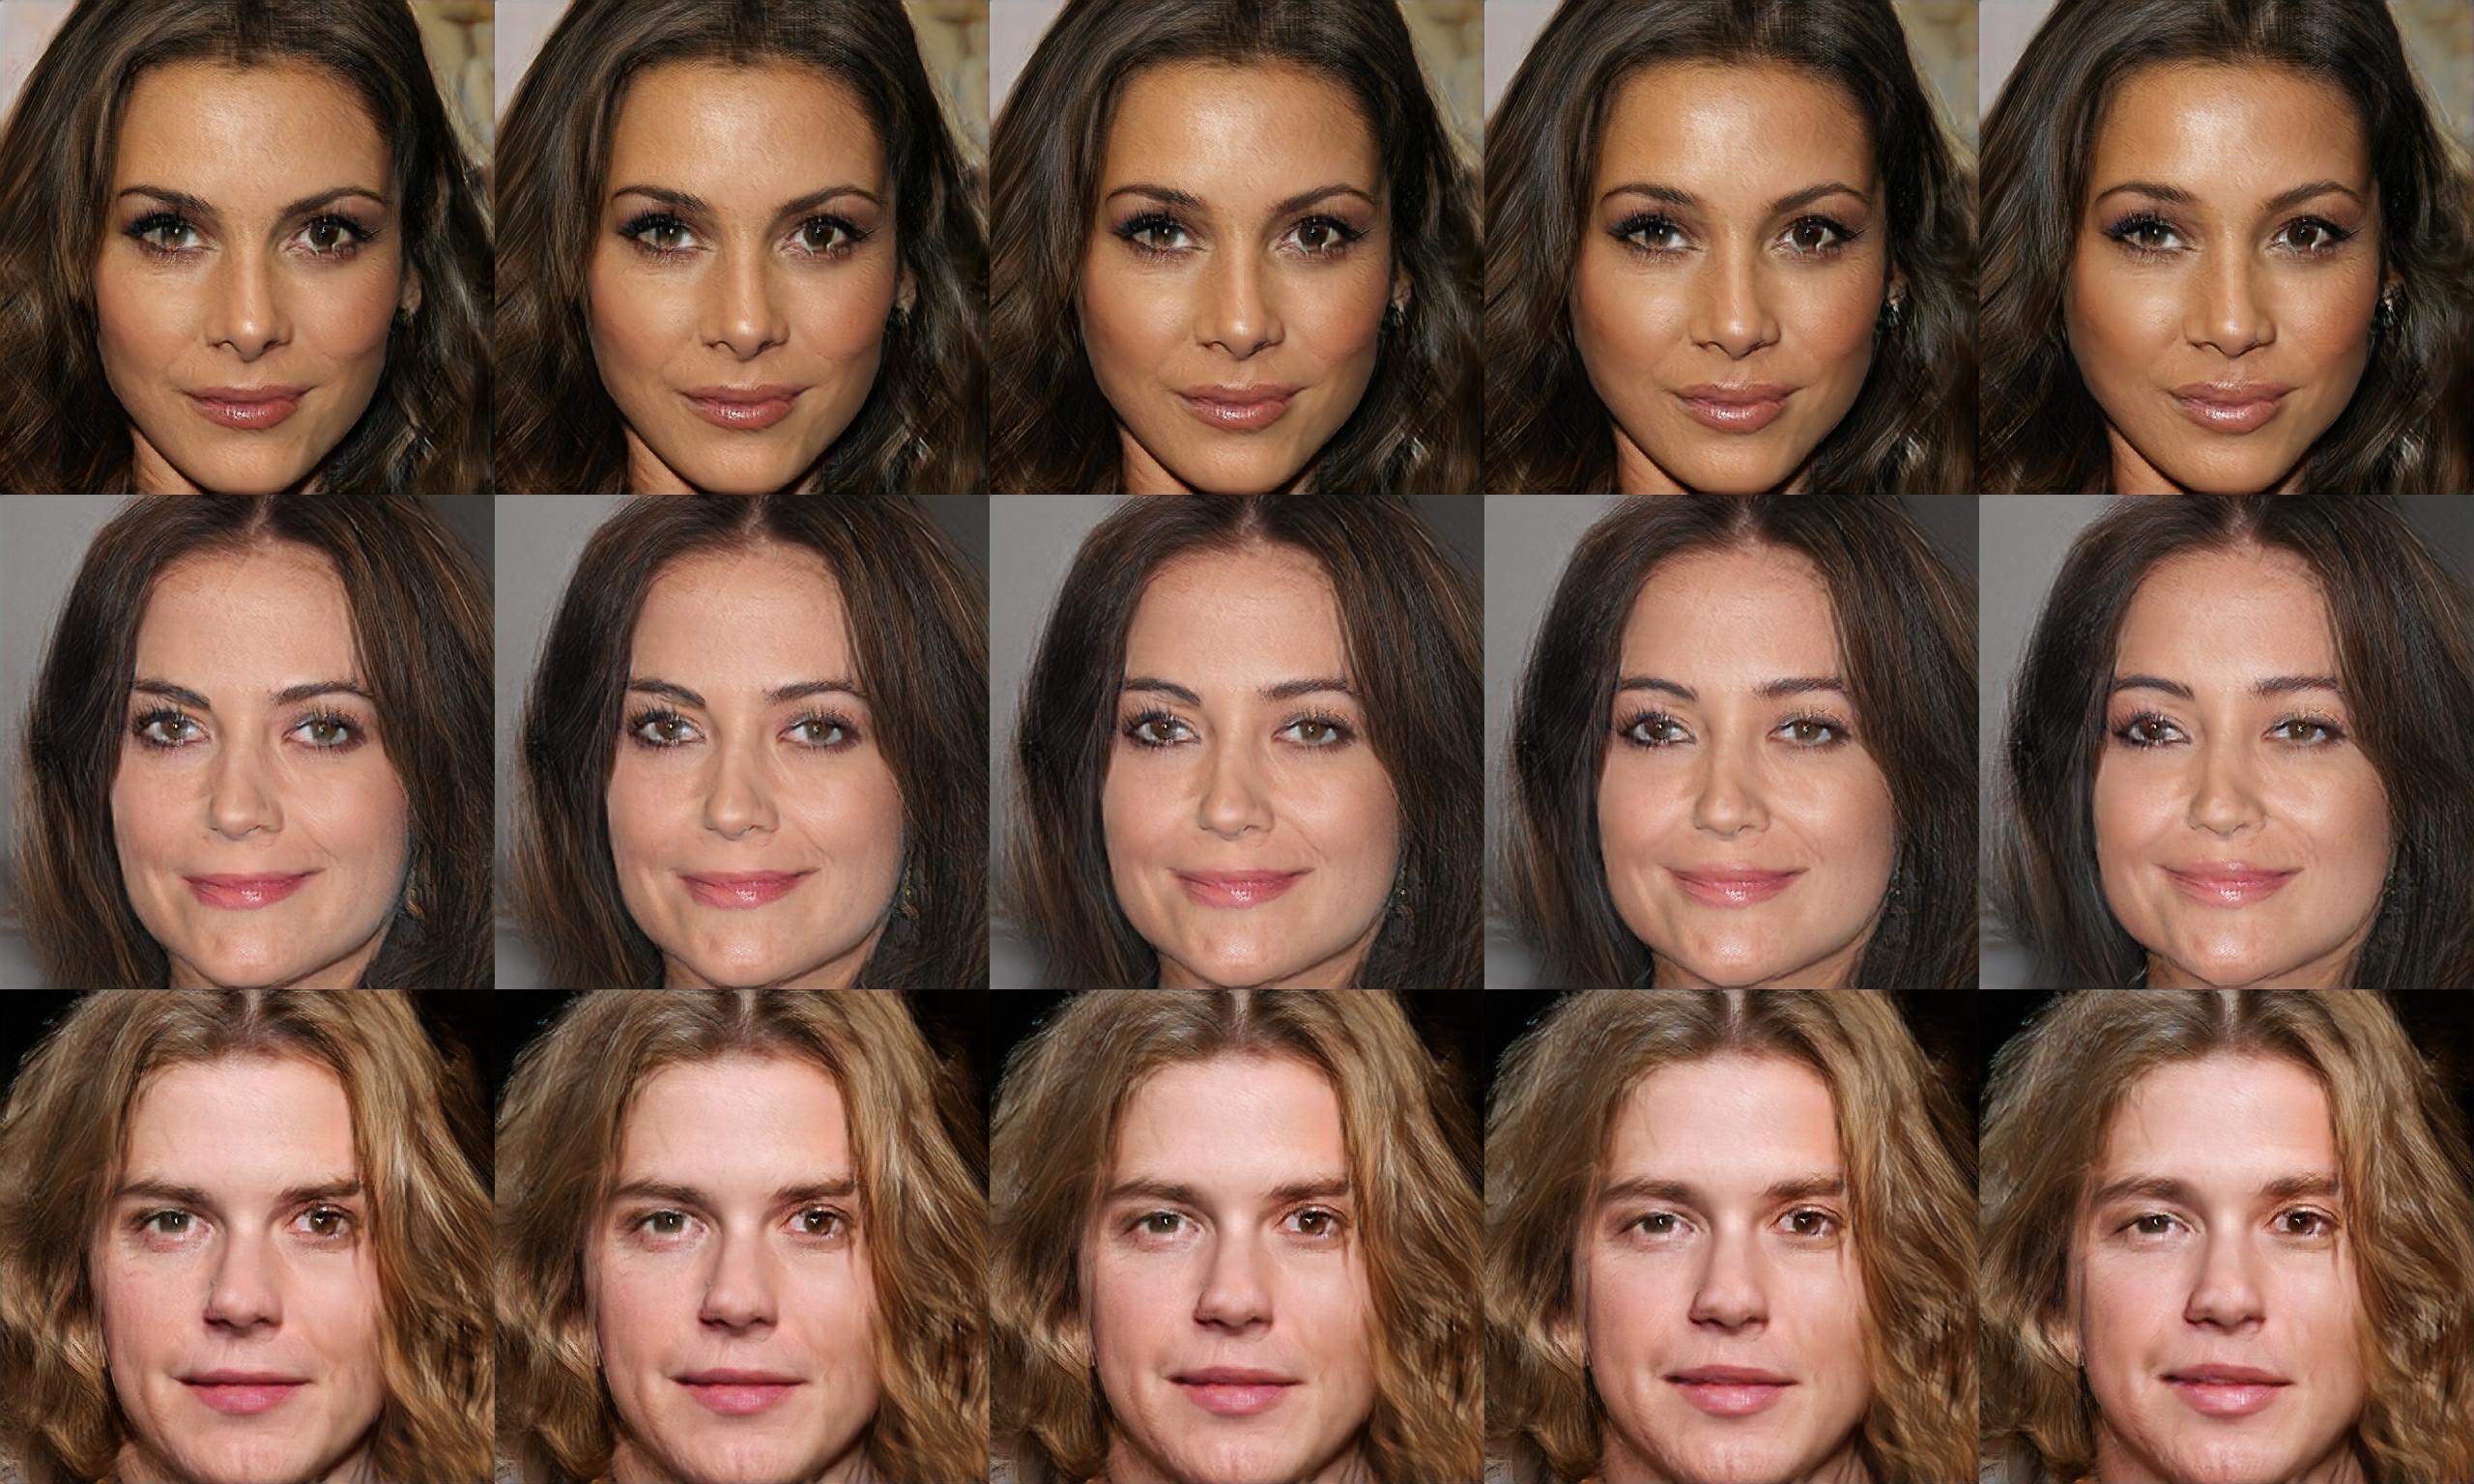 c_55_eyebrows_shape